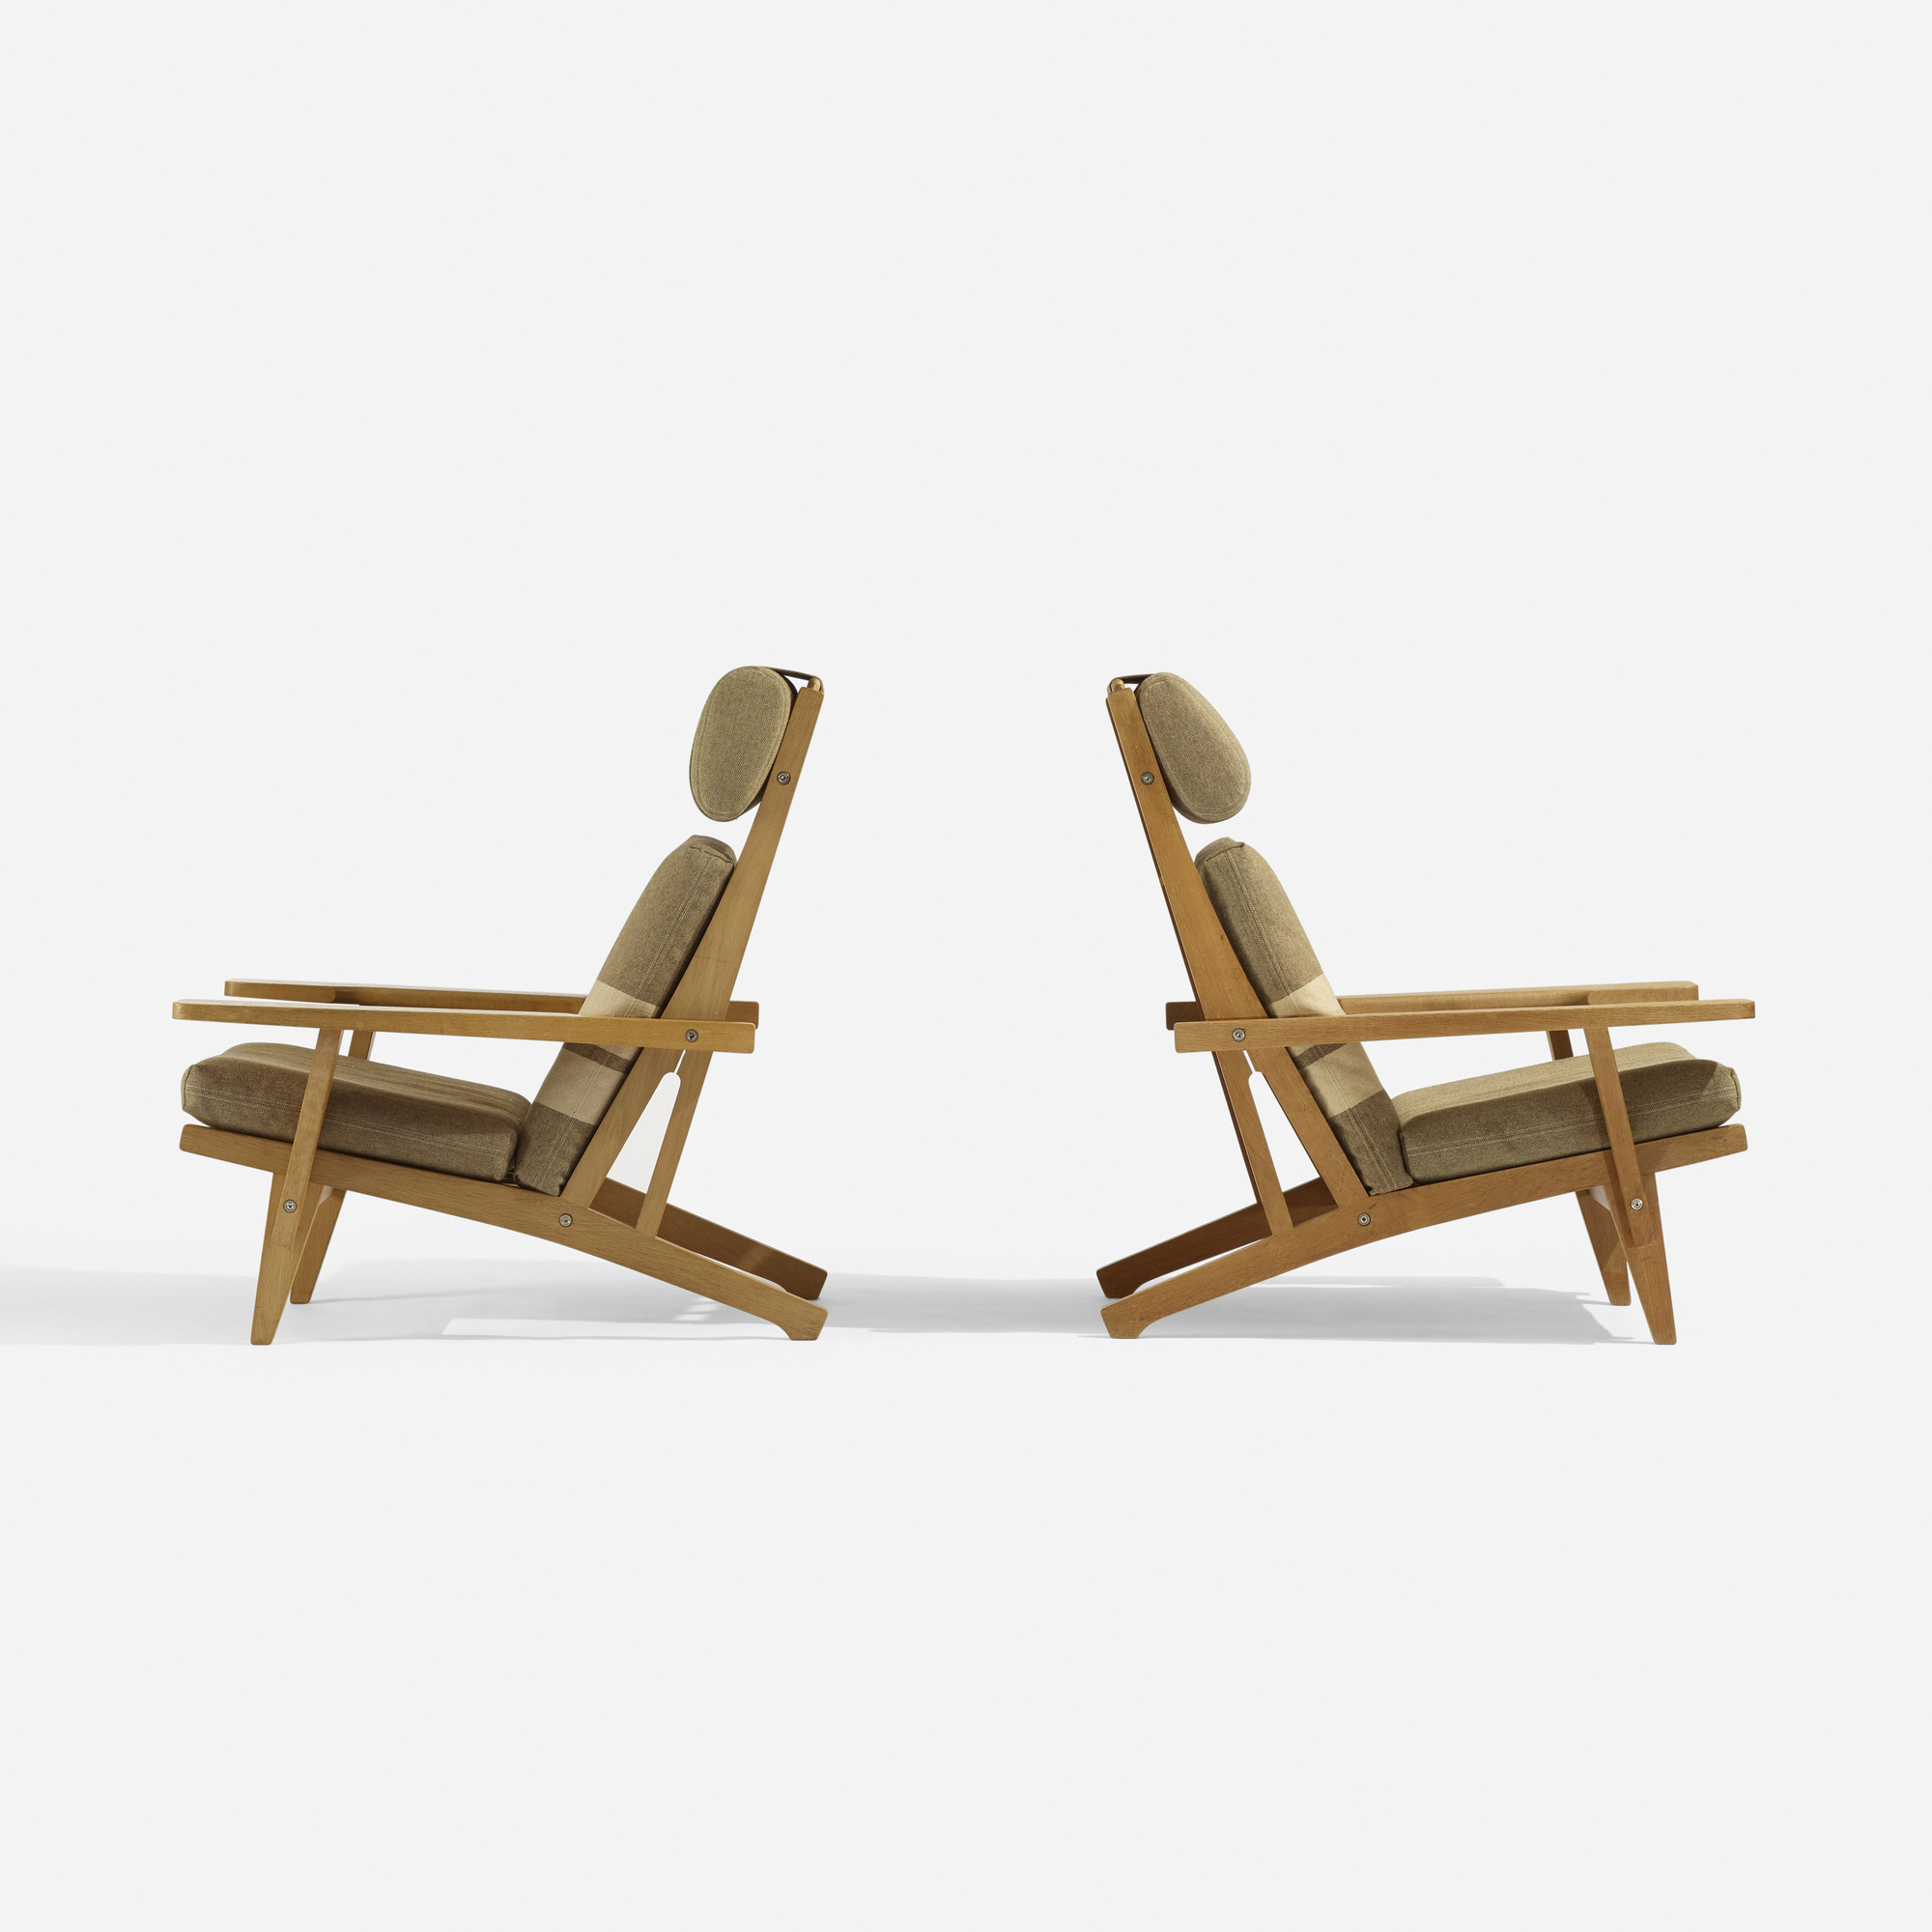 288: Hans J. Wegner / lounge chairs model GE375, pair (2 of 4)